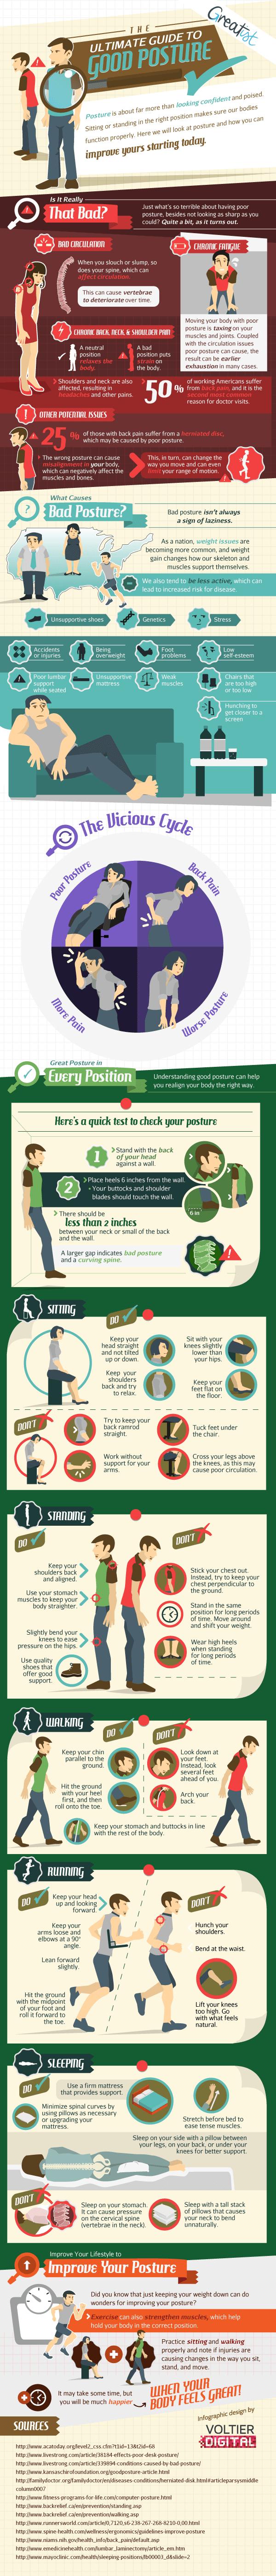 Good Posture Infographic